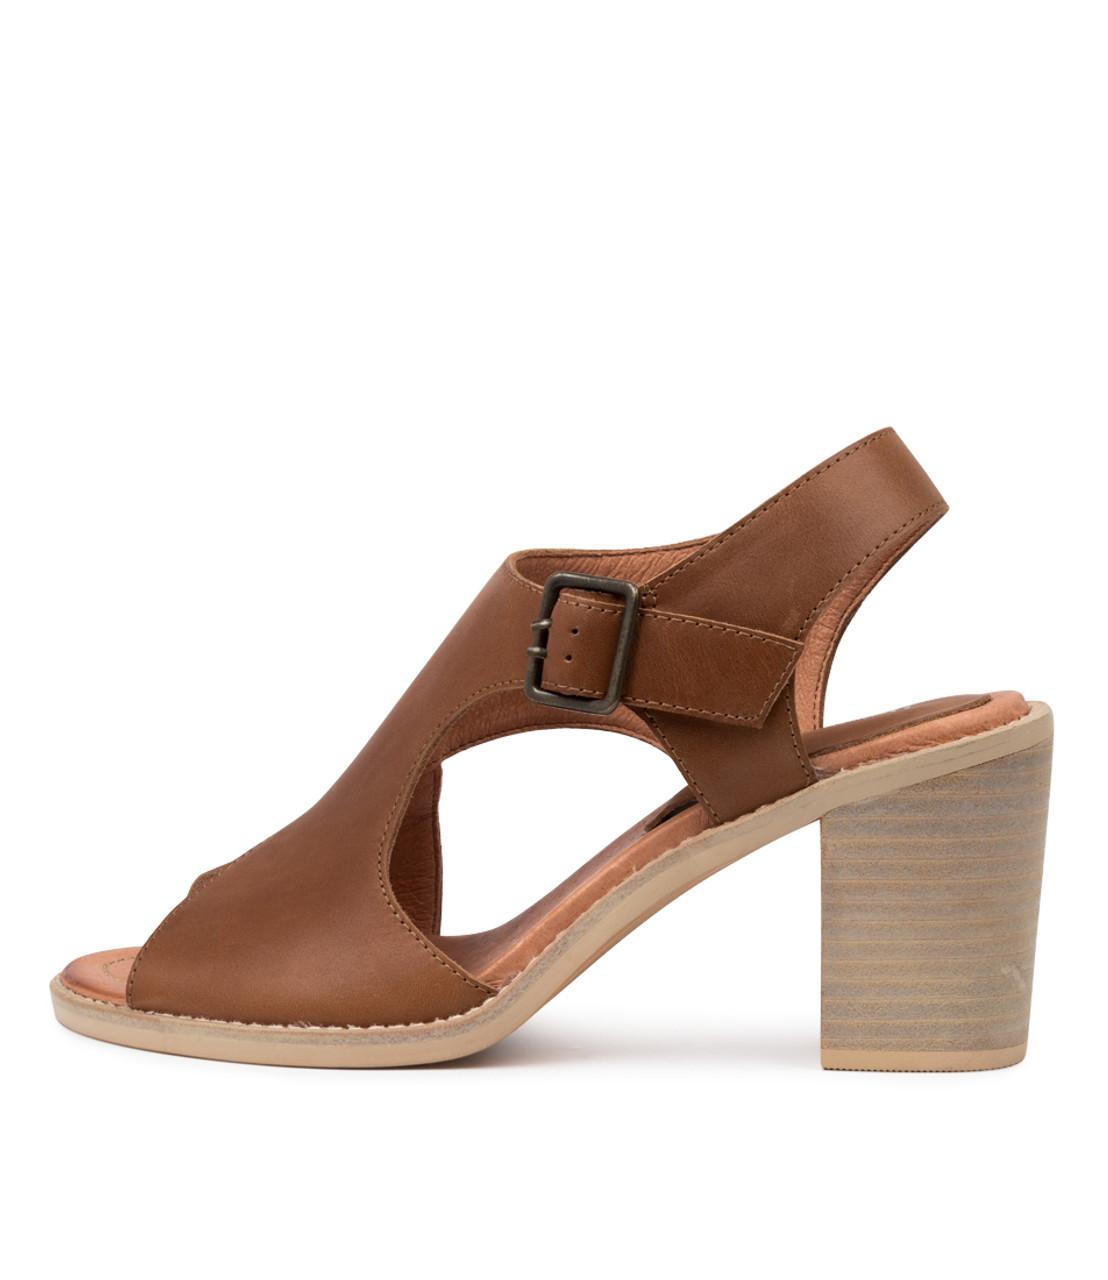 TOLLIET Sandals Dark Tan Leather Django and Juliette